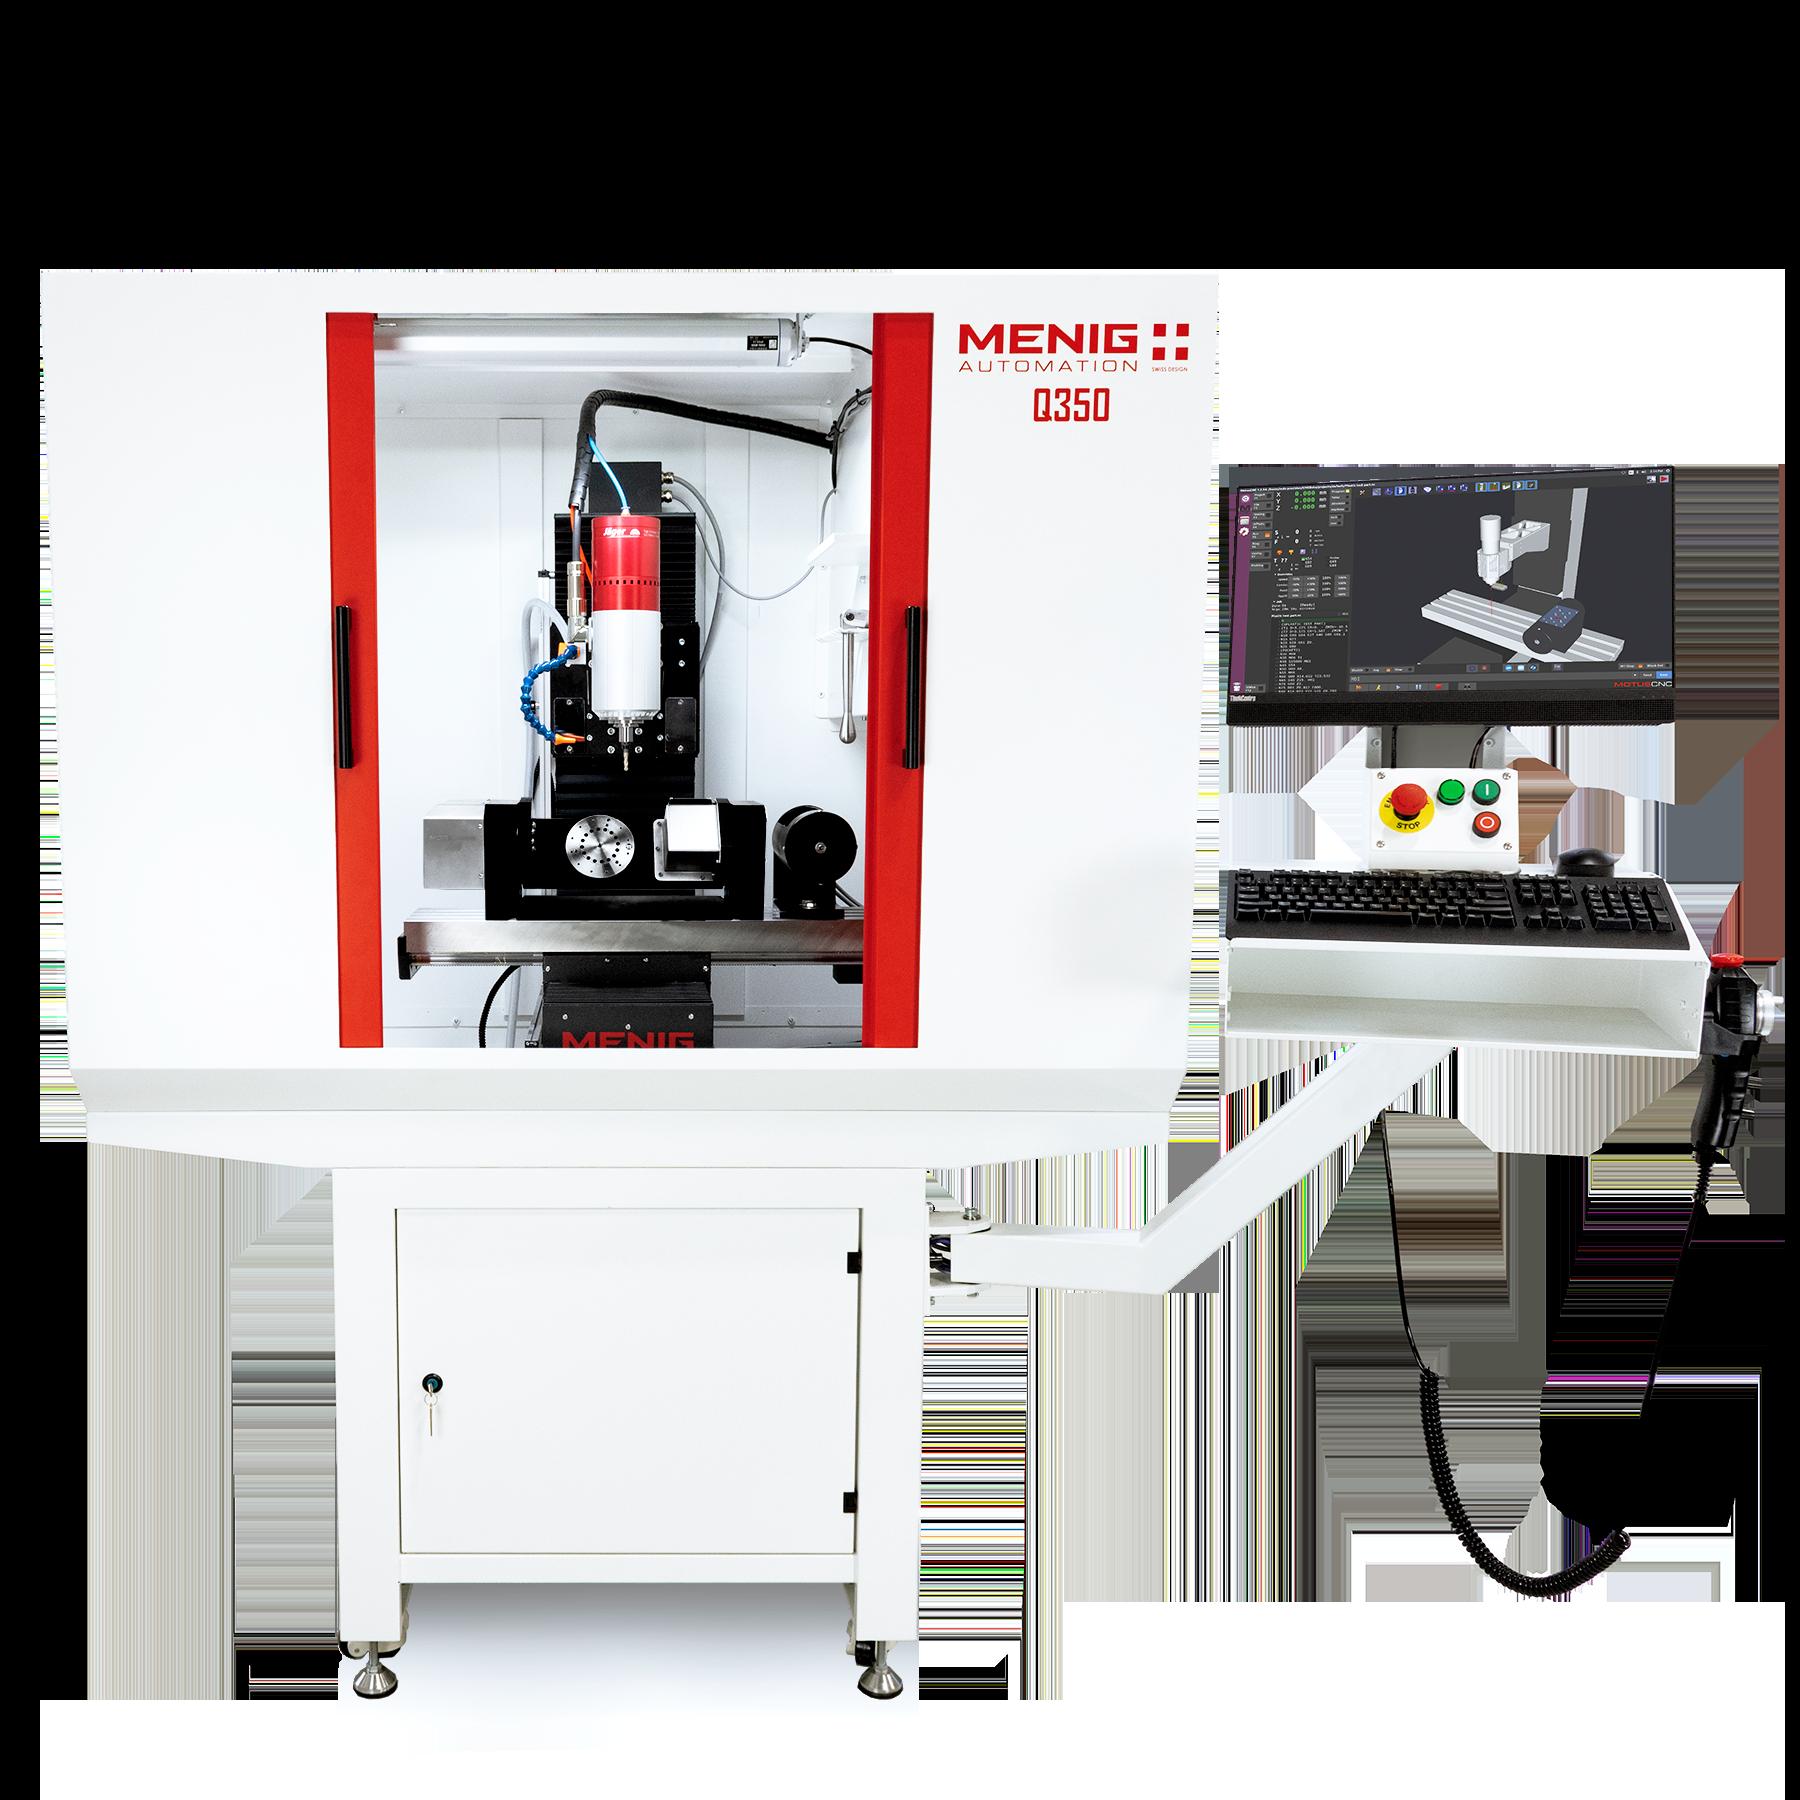 tn5 q350 front whole machine